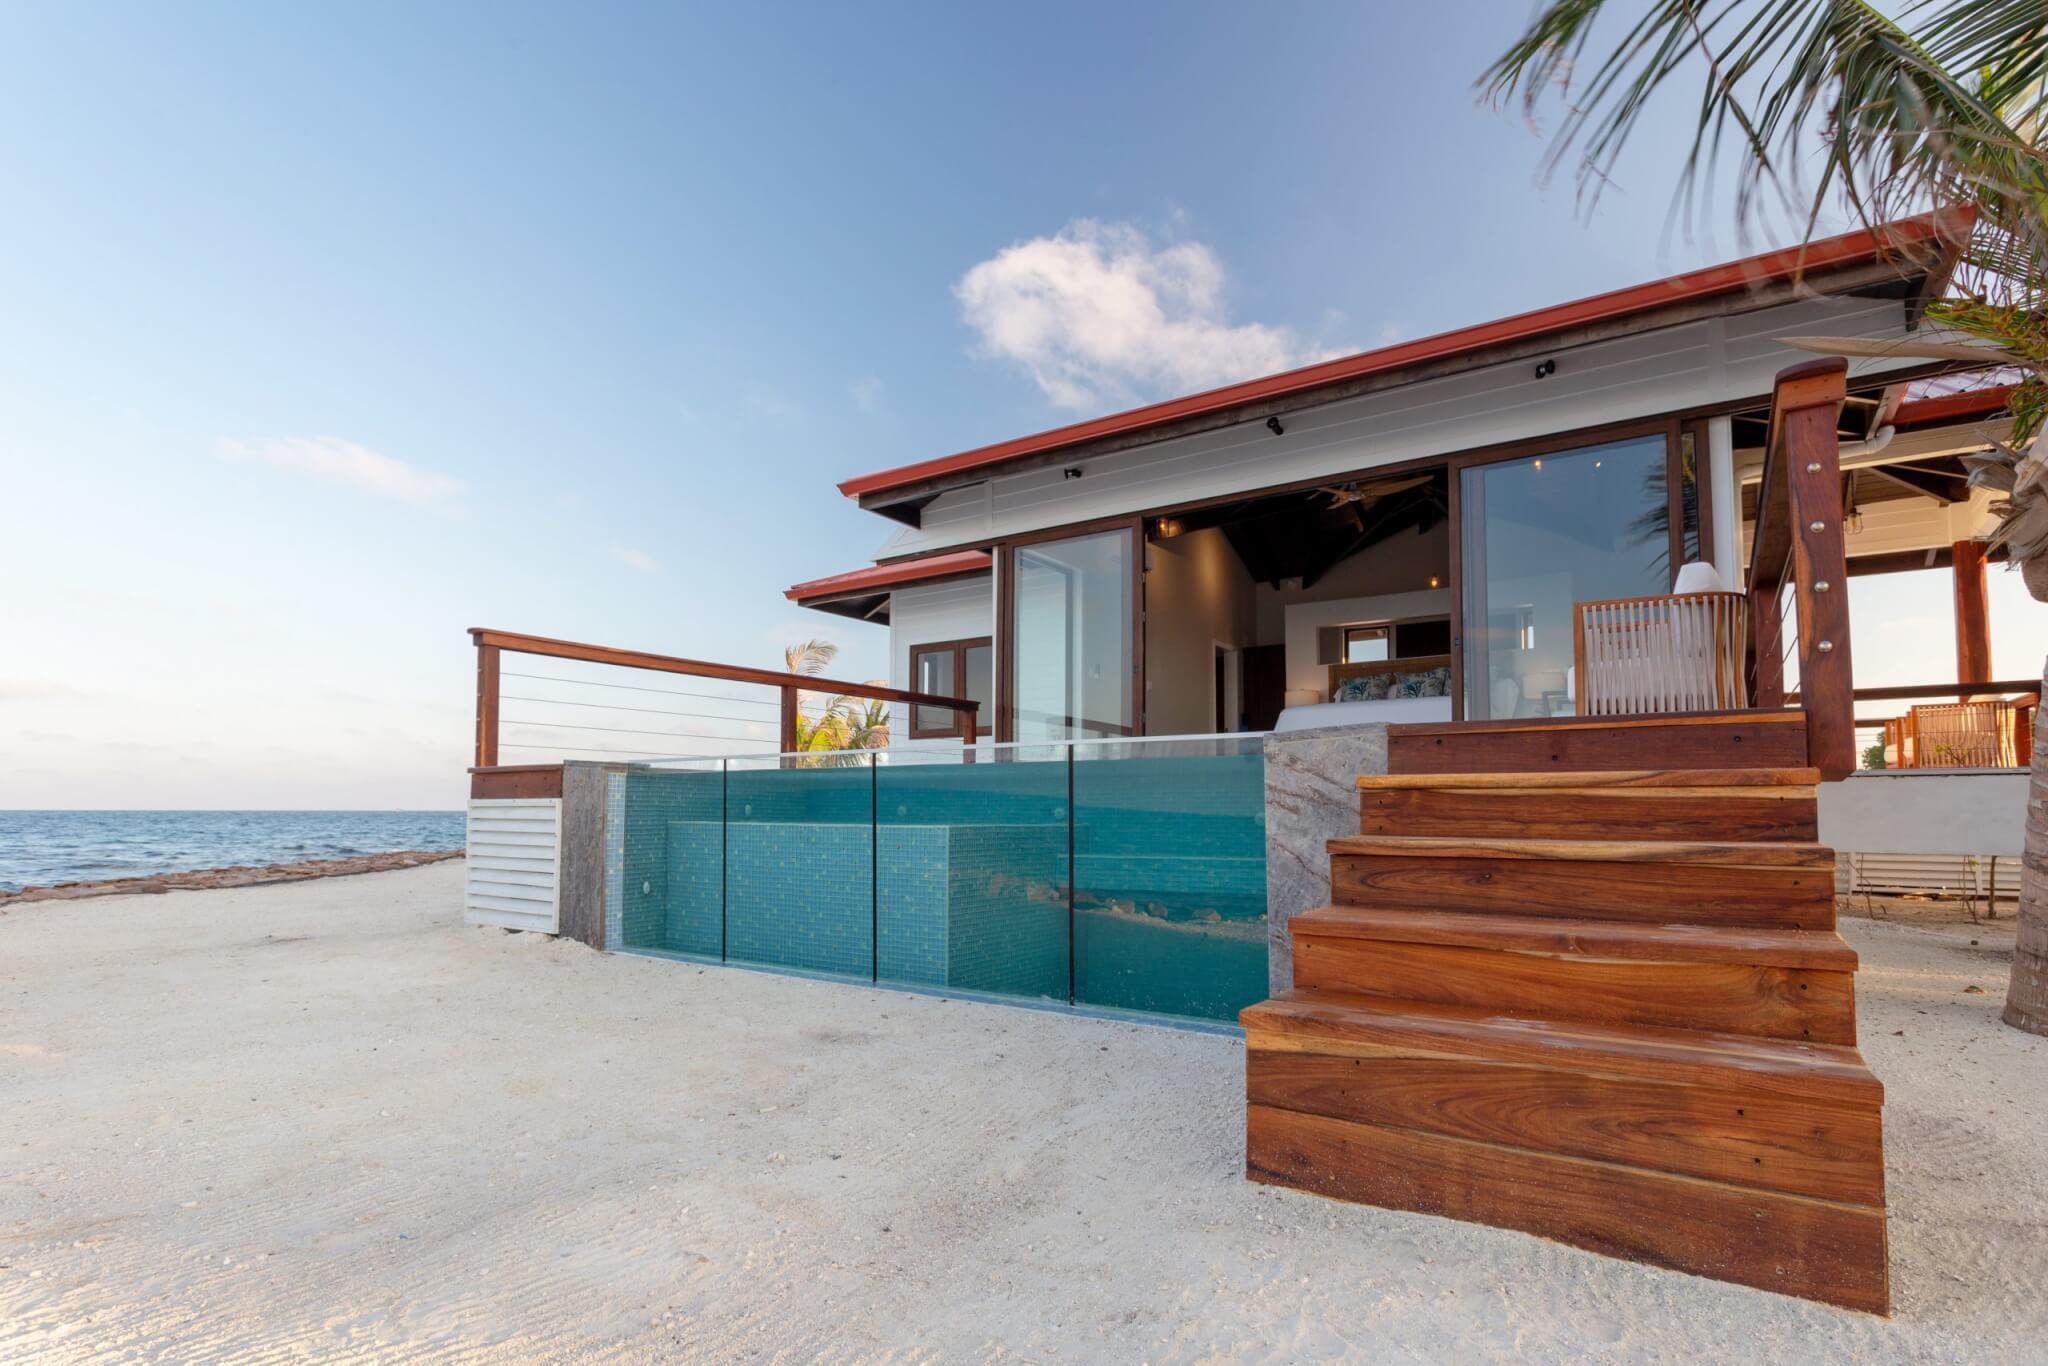 Belize Summer Island Vacations